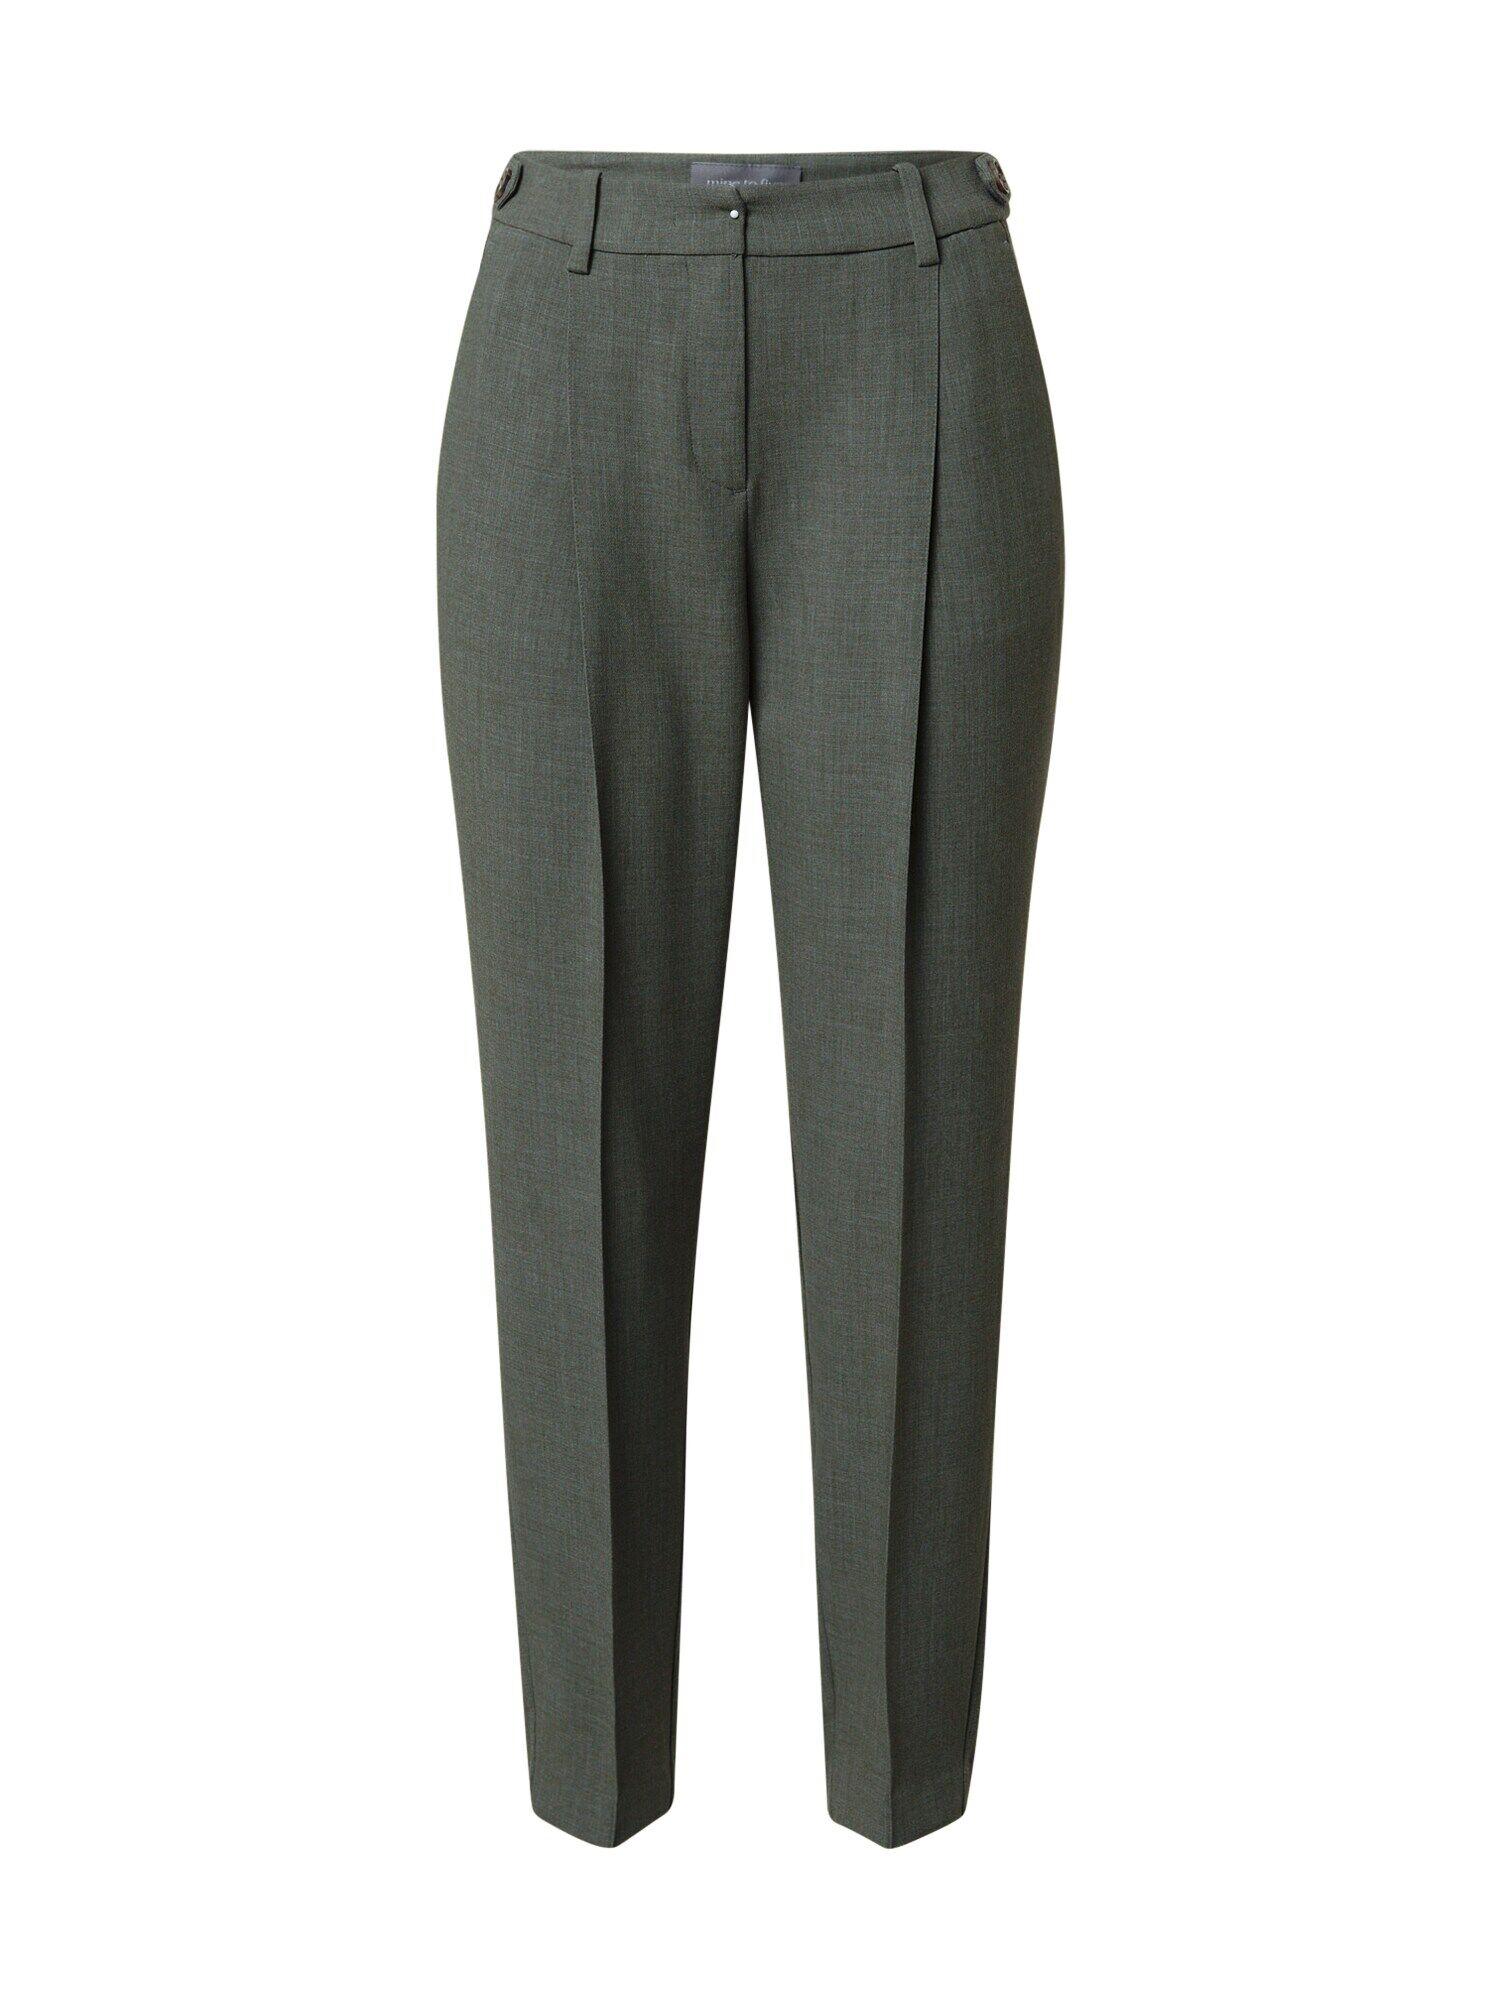 MINE TO FIVE Pantalon à pince  - Vert - Taille: 38 - female